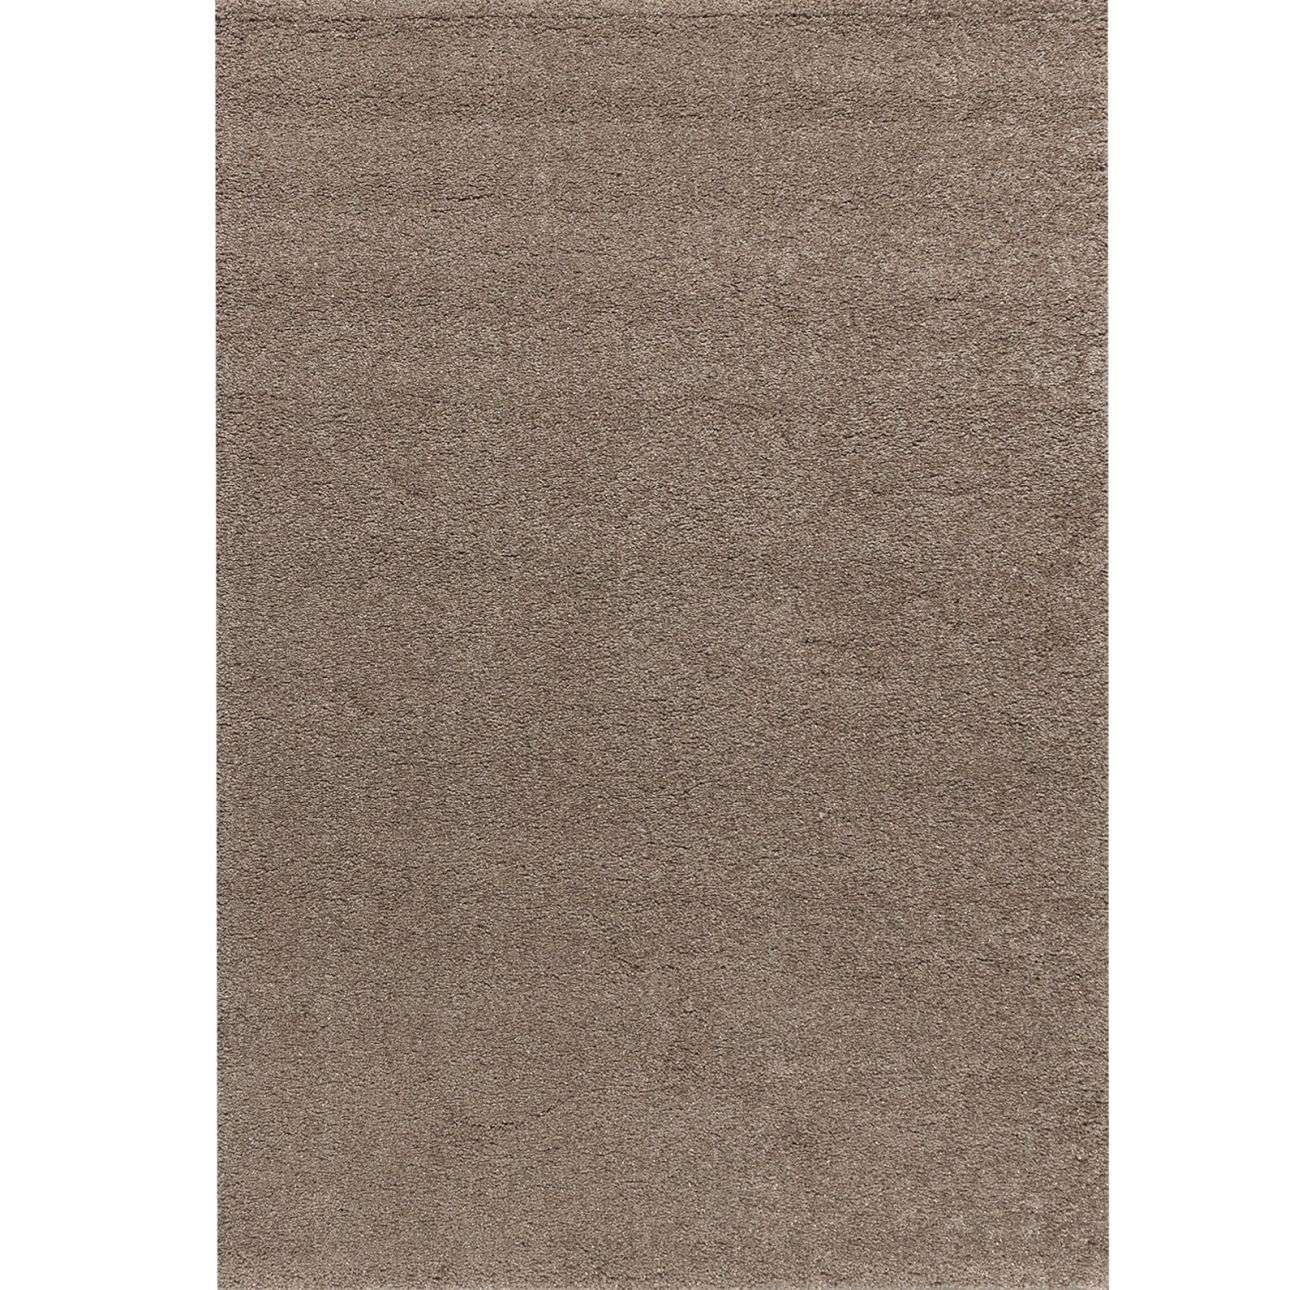 Dywan Deluxe Brown/gold 160x230cm  160x230cm